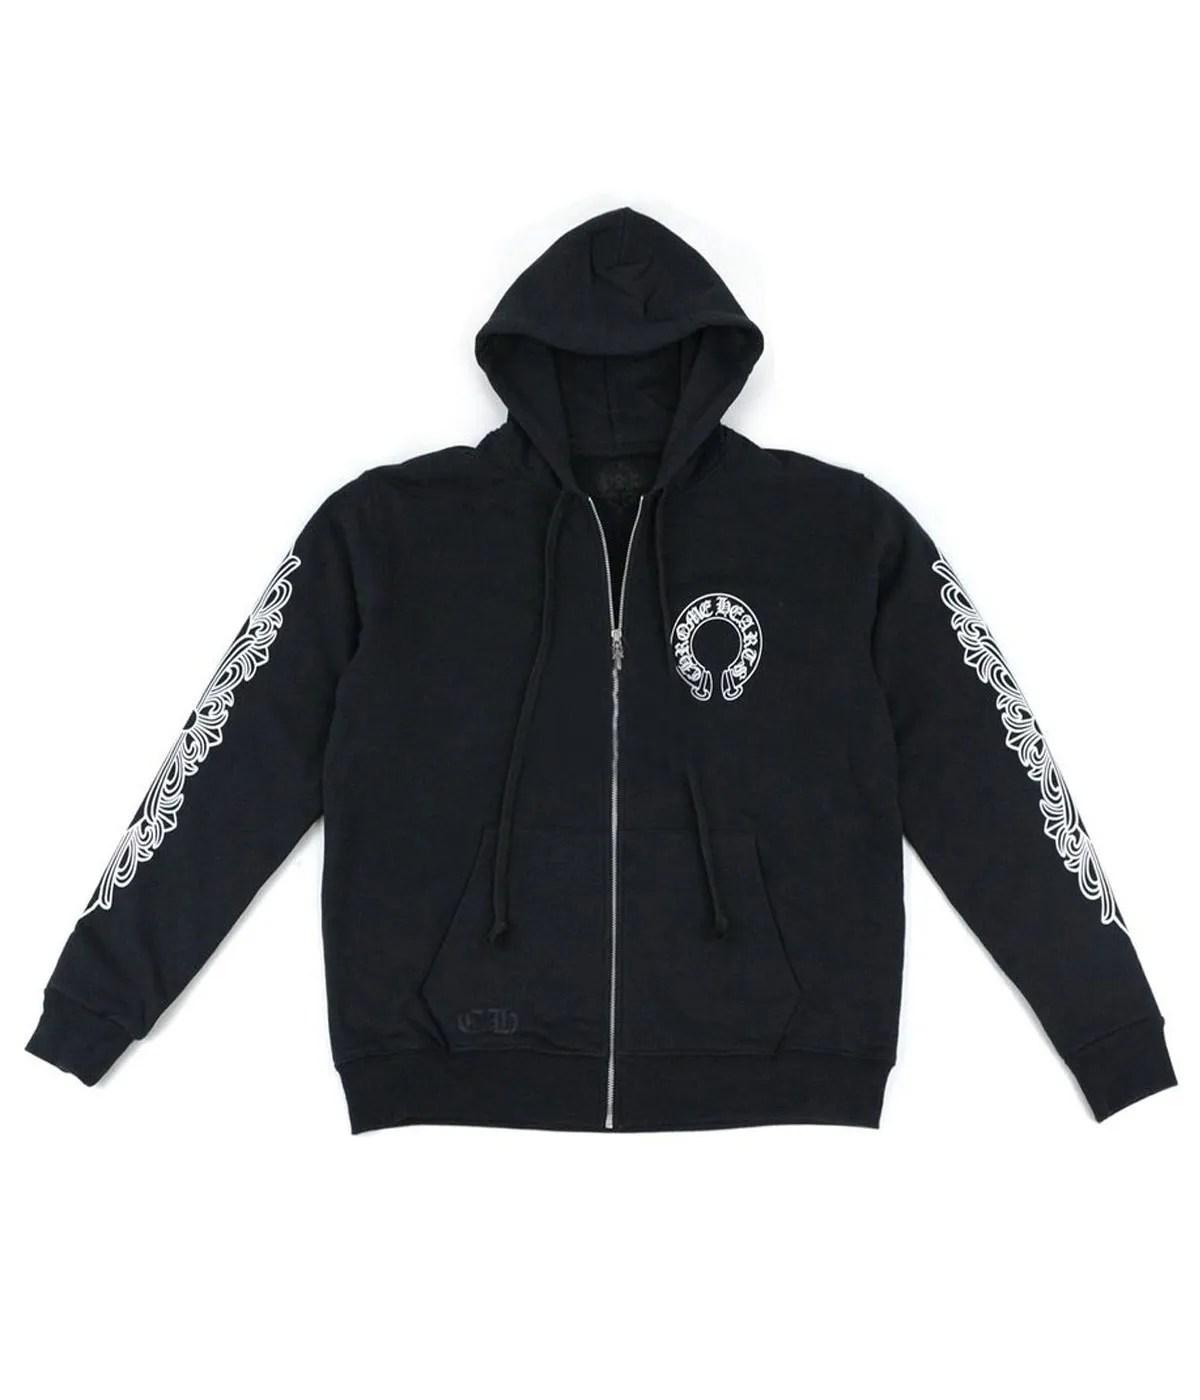 chrome-hearts-hoodie